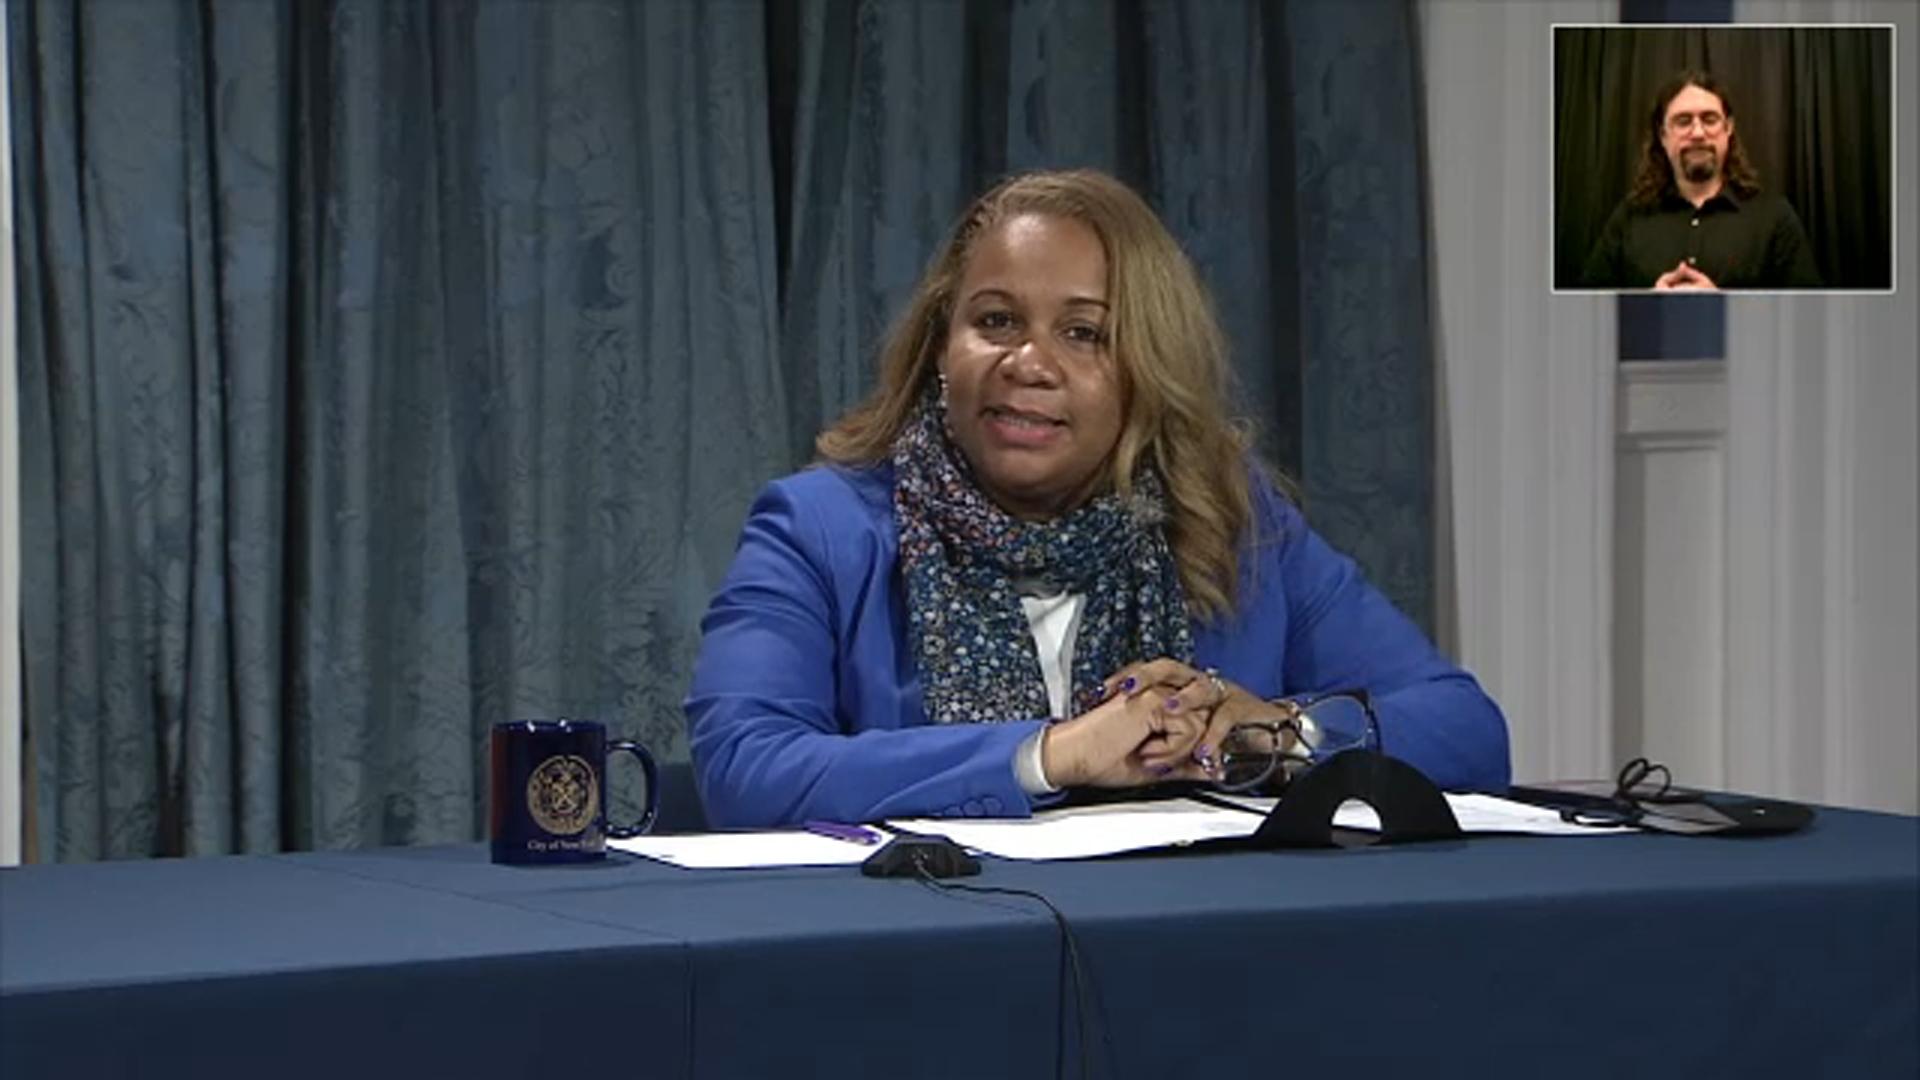 Meet NYC's new incoming Schools Chancellor Meisha Porter